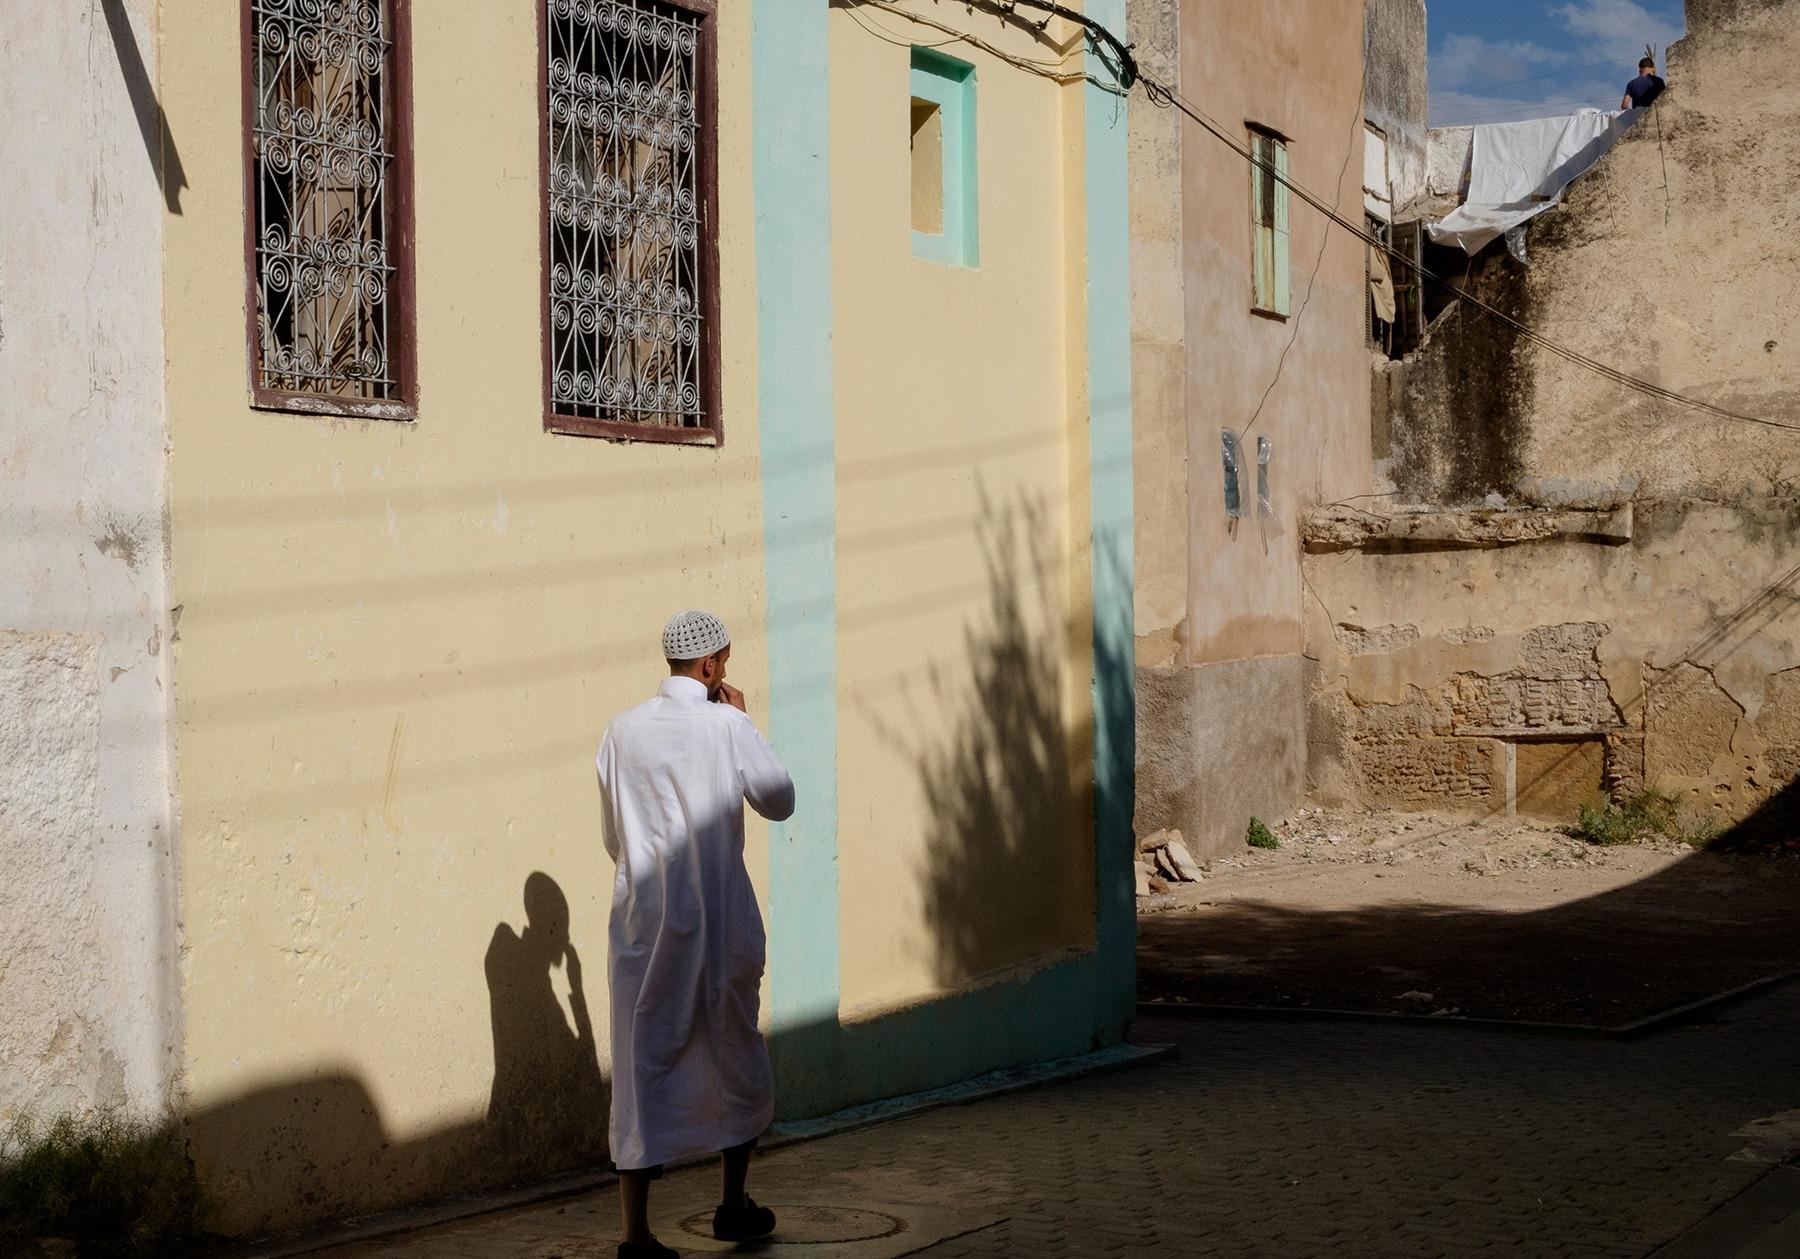 Jewish quarter, Morocco